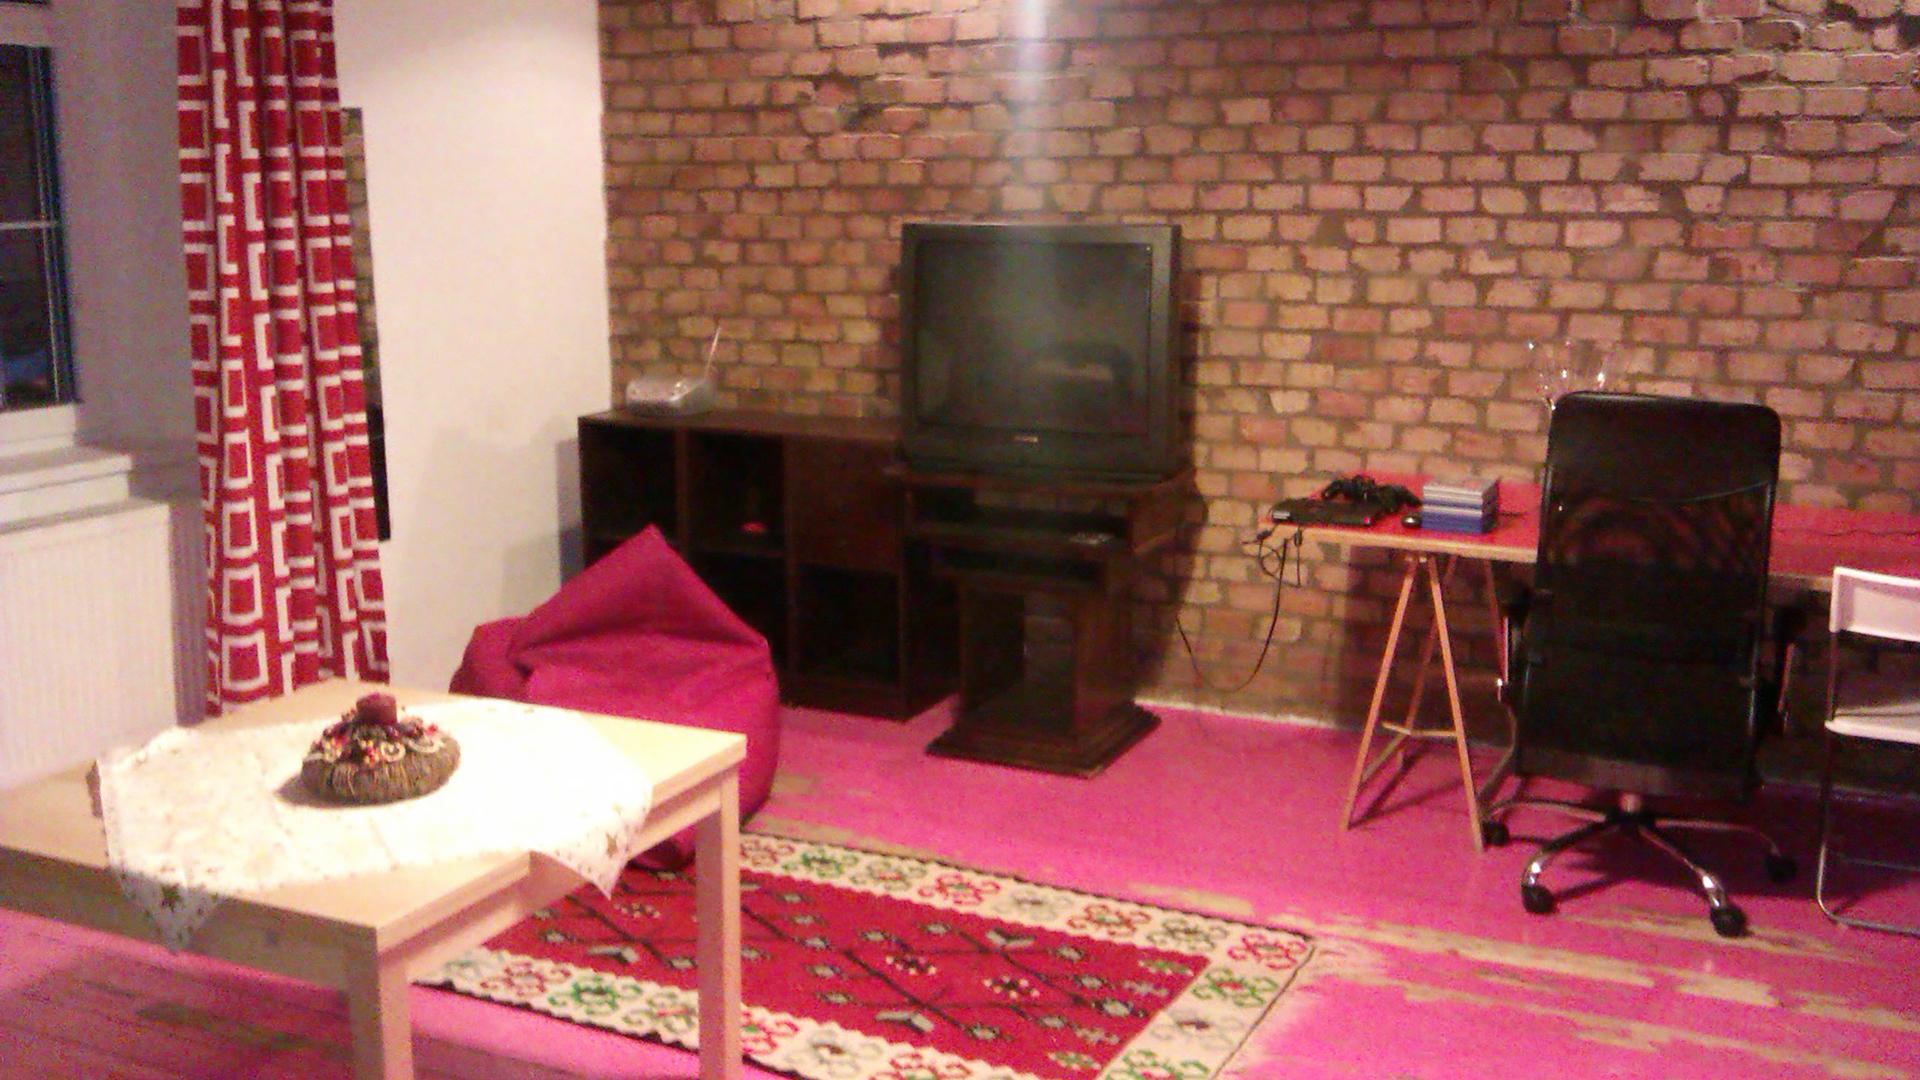 Byt, 3 izbový, Bratislava Nivy – PRENAJATÉ